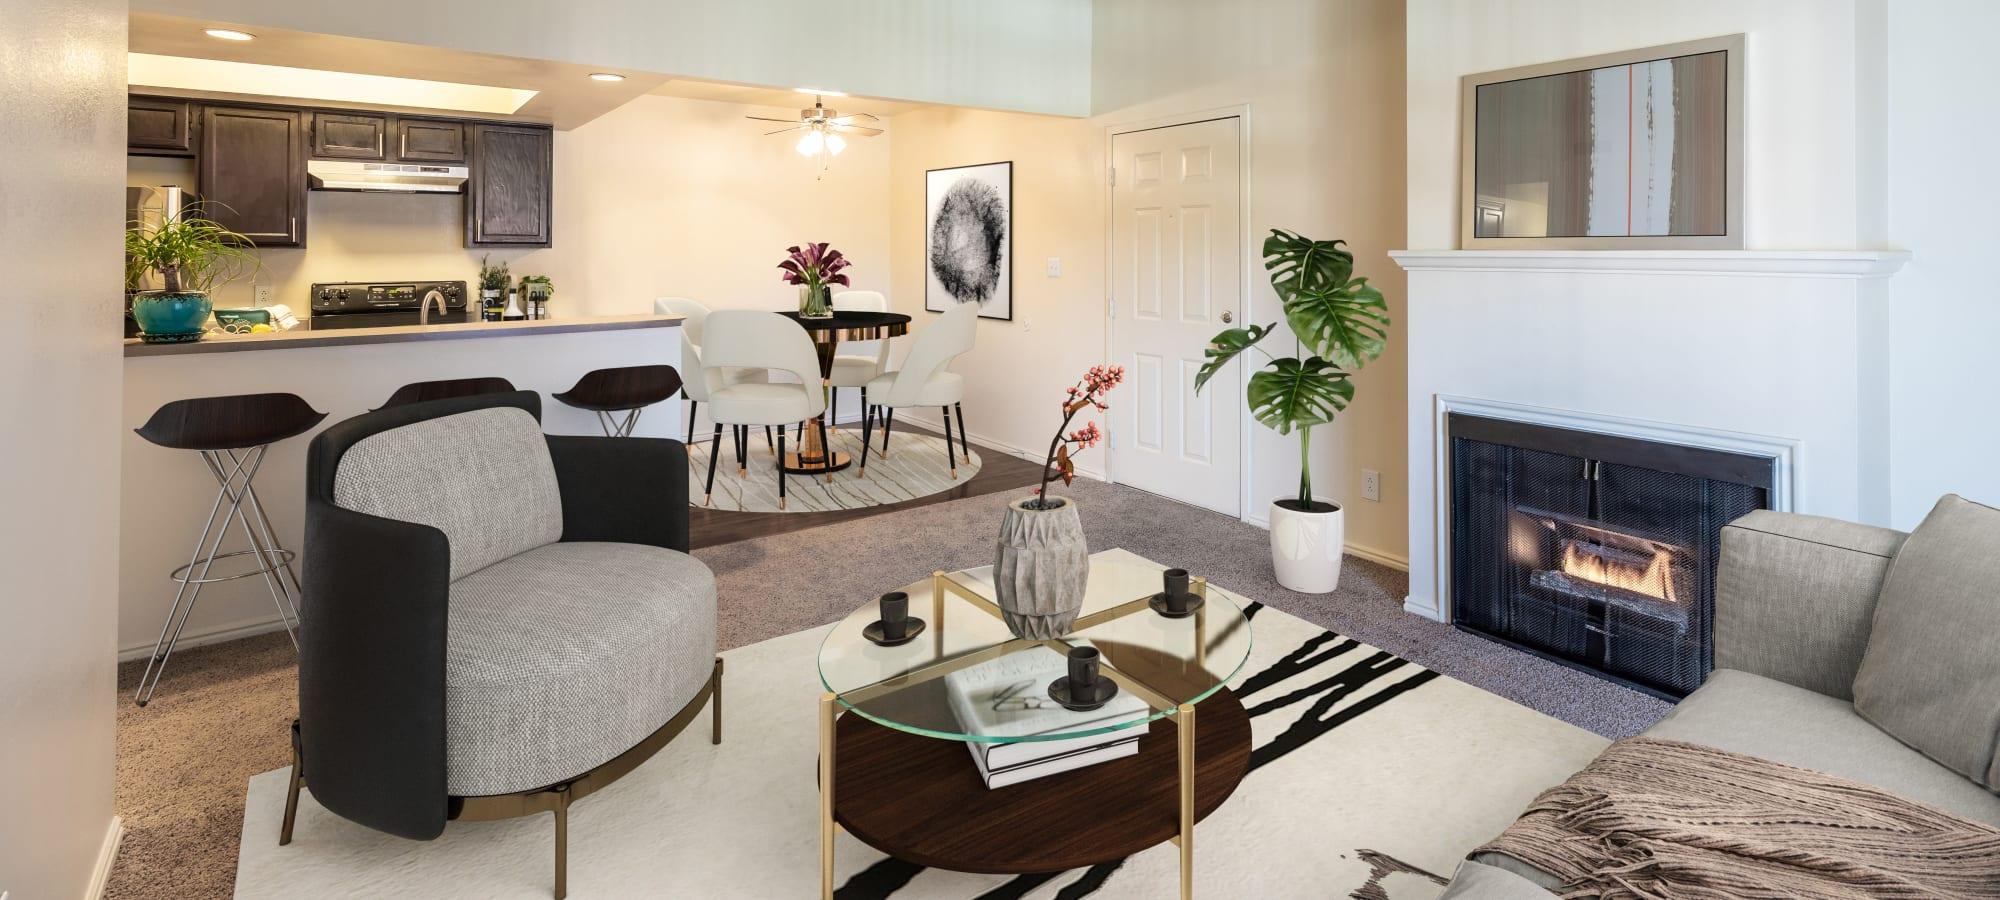 West Valley City, Utah apartments at Shadowbrook Apartments